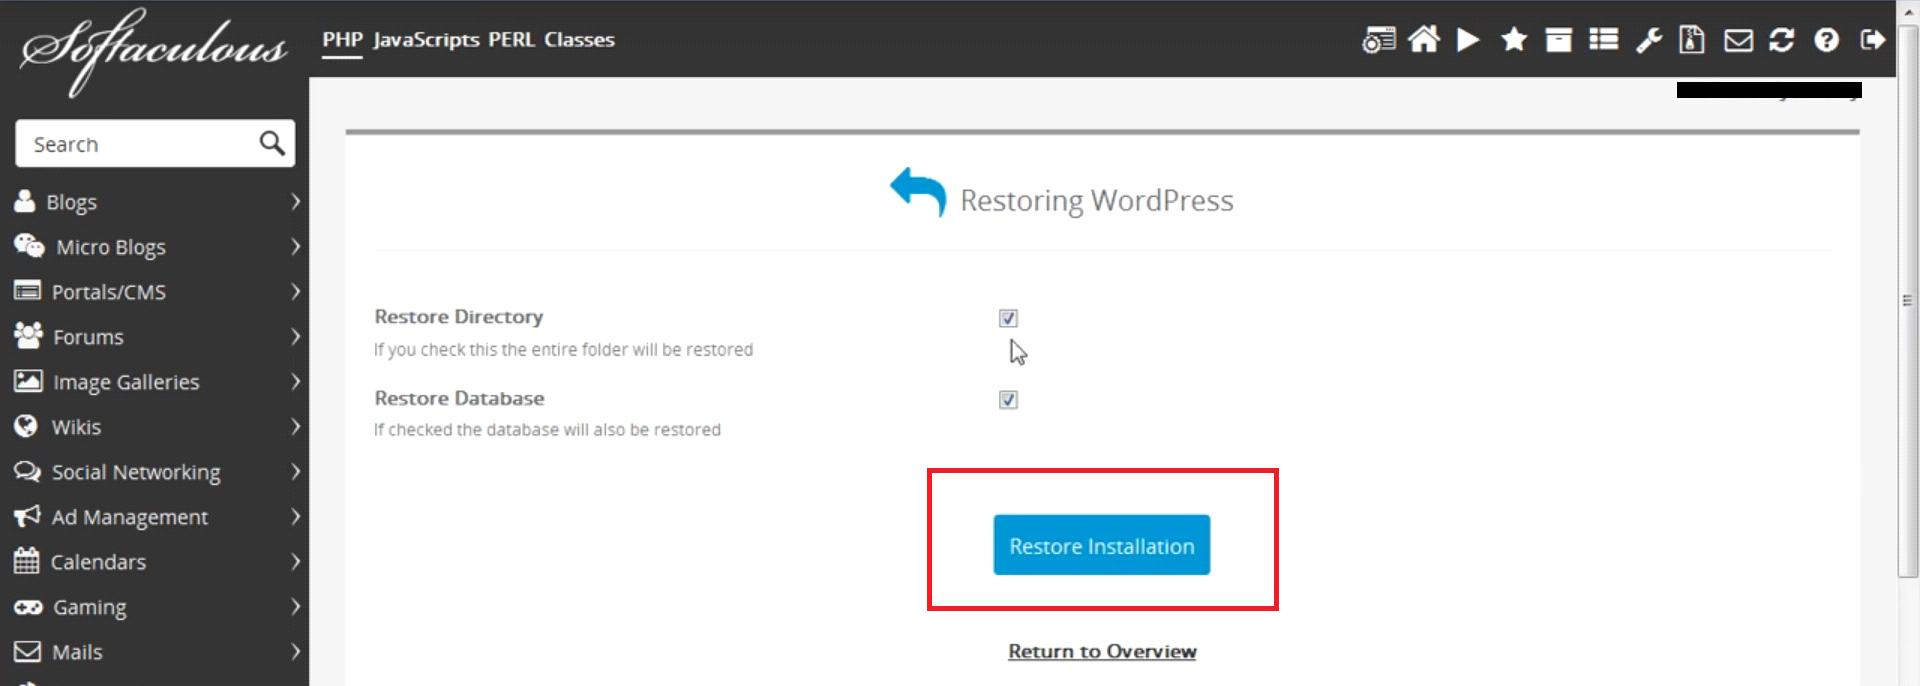 WordPress Backup Restoration from Softaculous